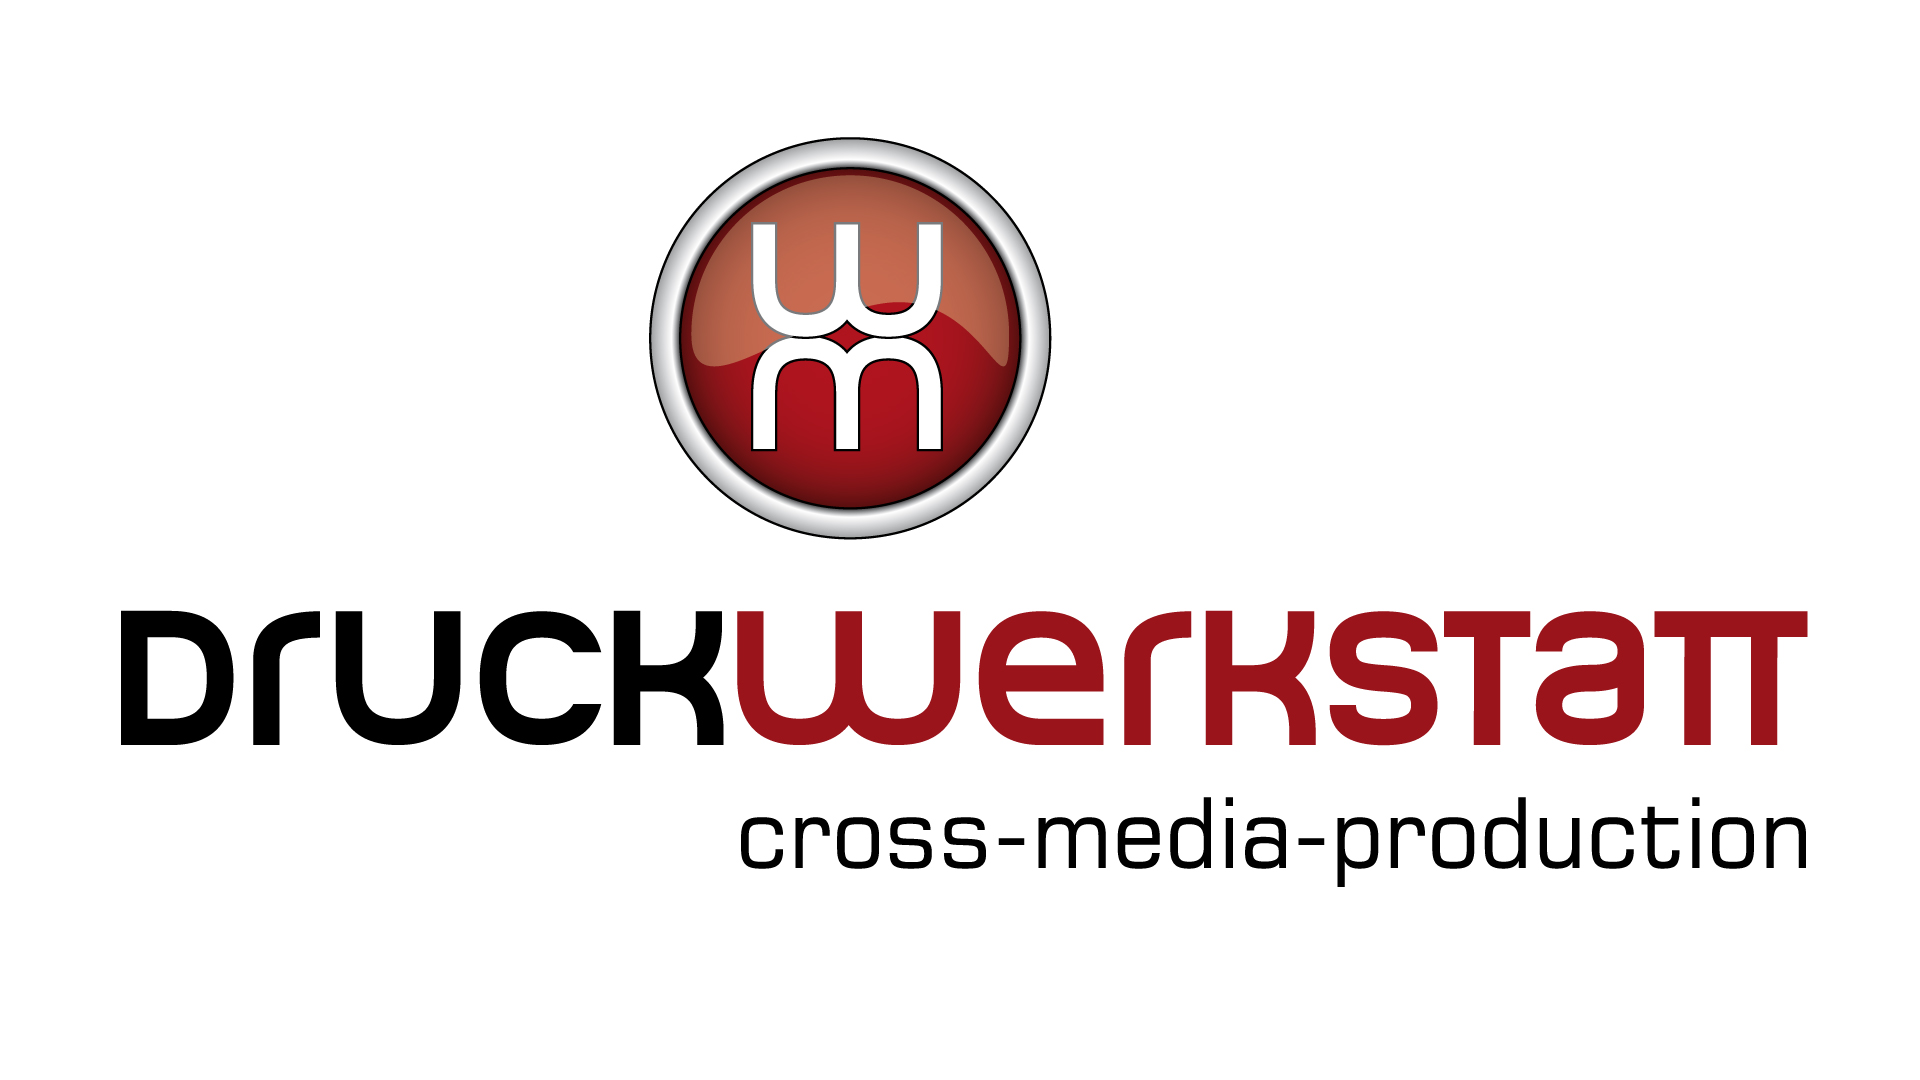 Druckwerkstatt Handels GmbH